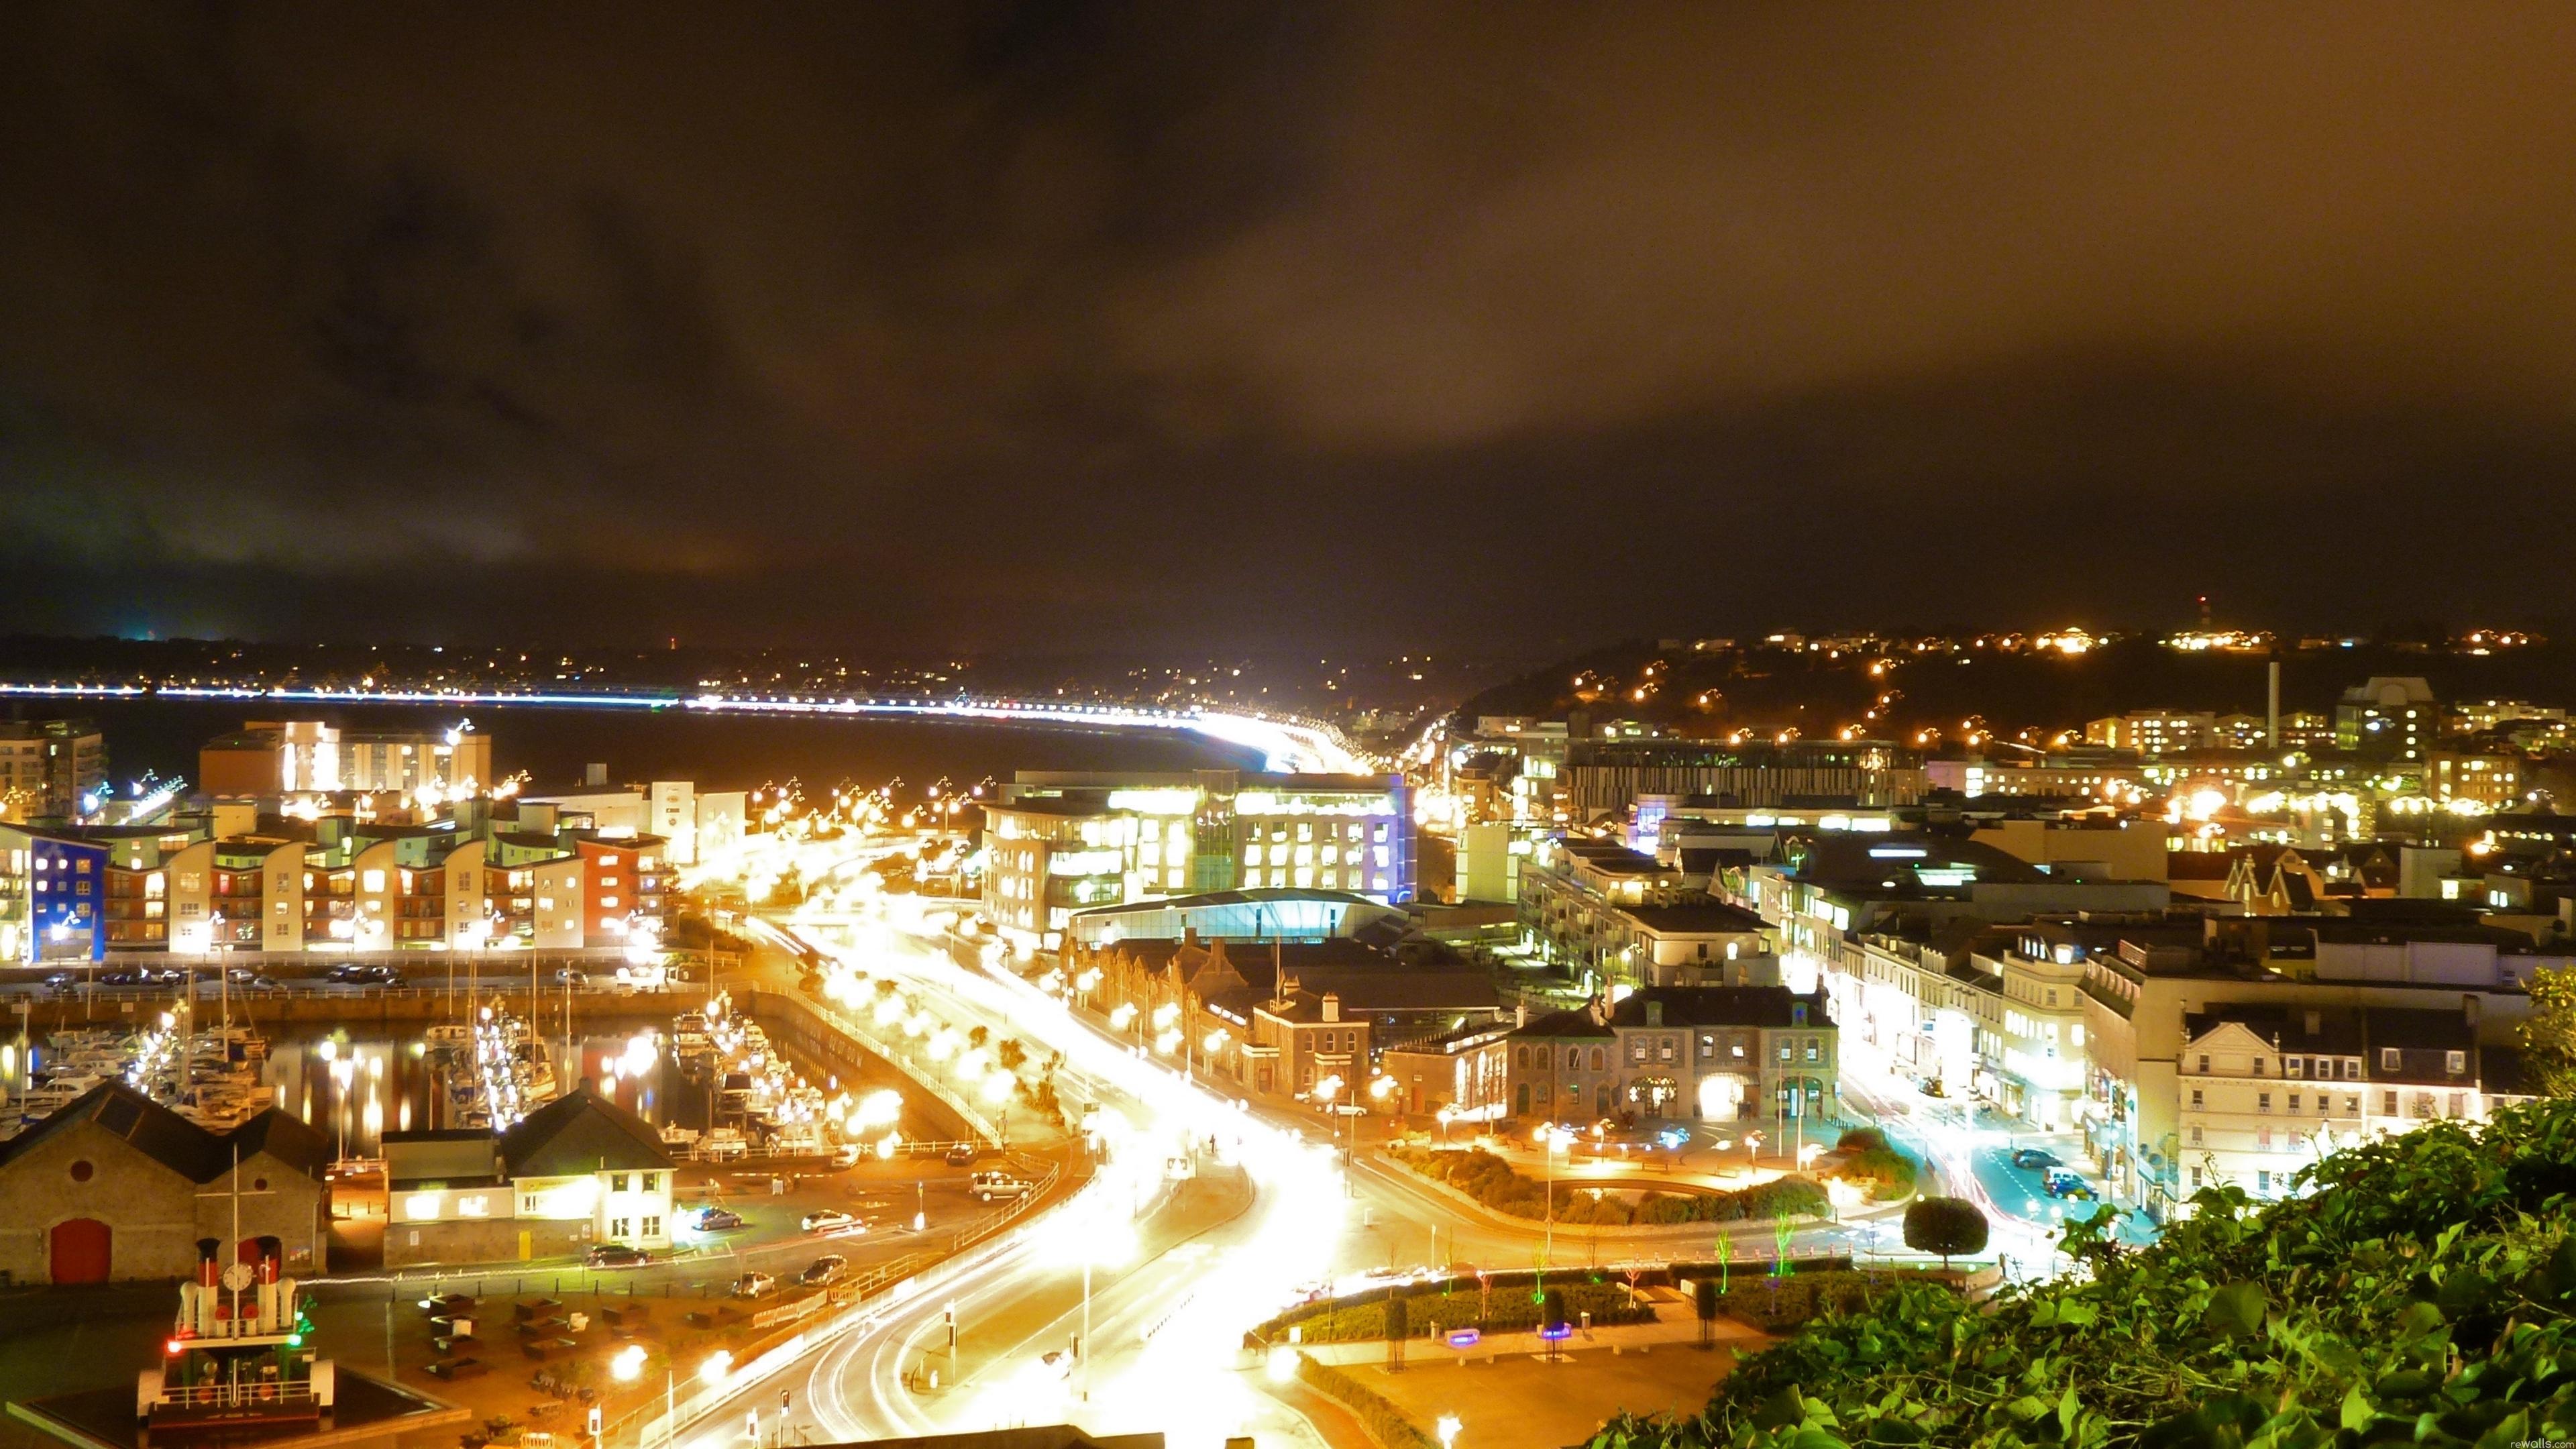 jersey saint helier cityscape night 4k 1538065142 - jersey, saint helier, cityscape, night 4k - saint helier, Jersey, Cityscape